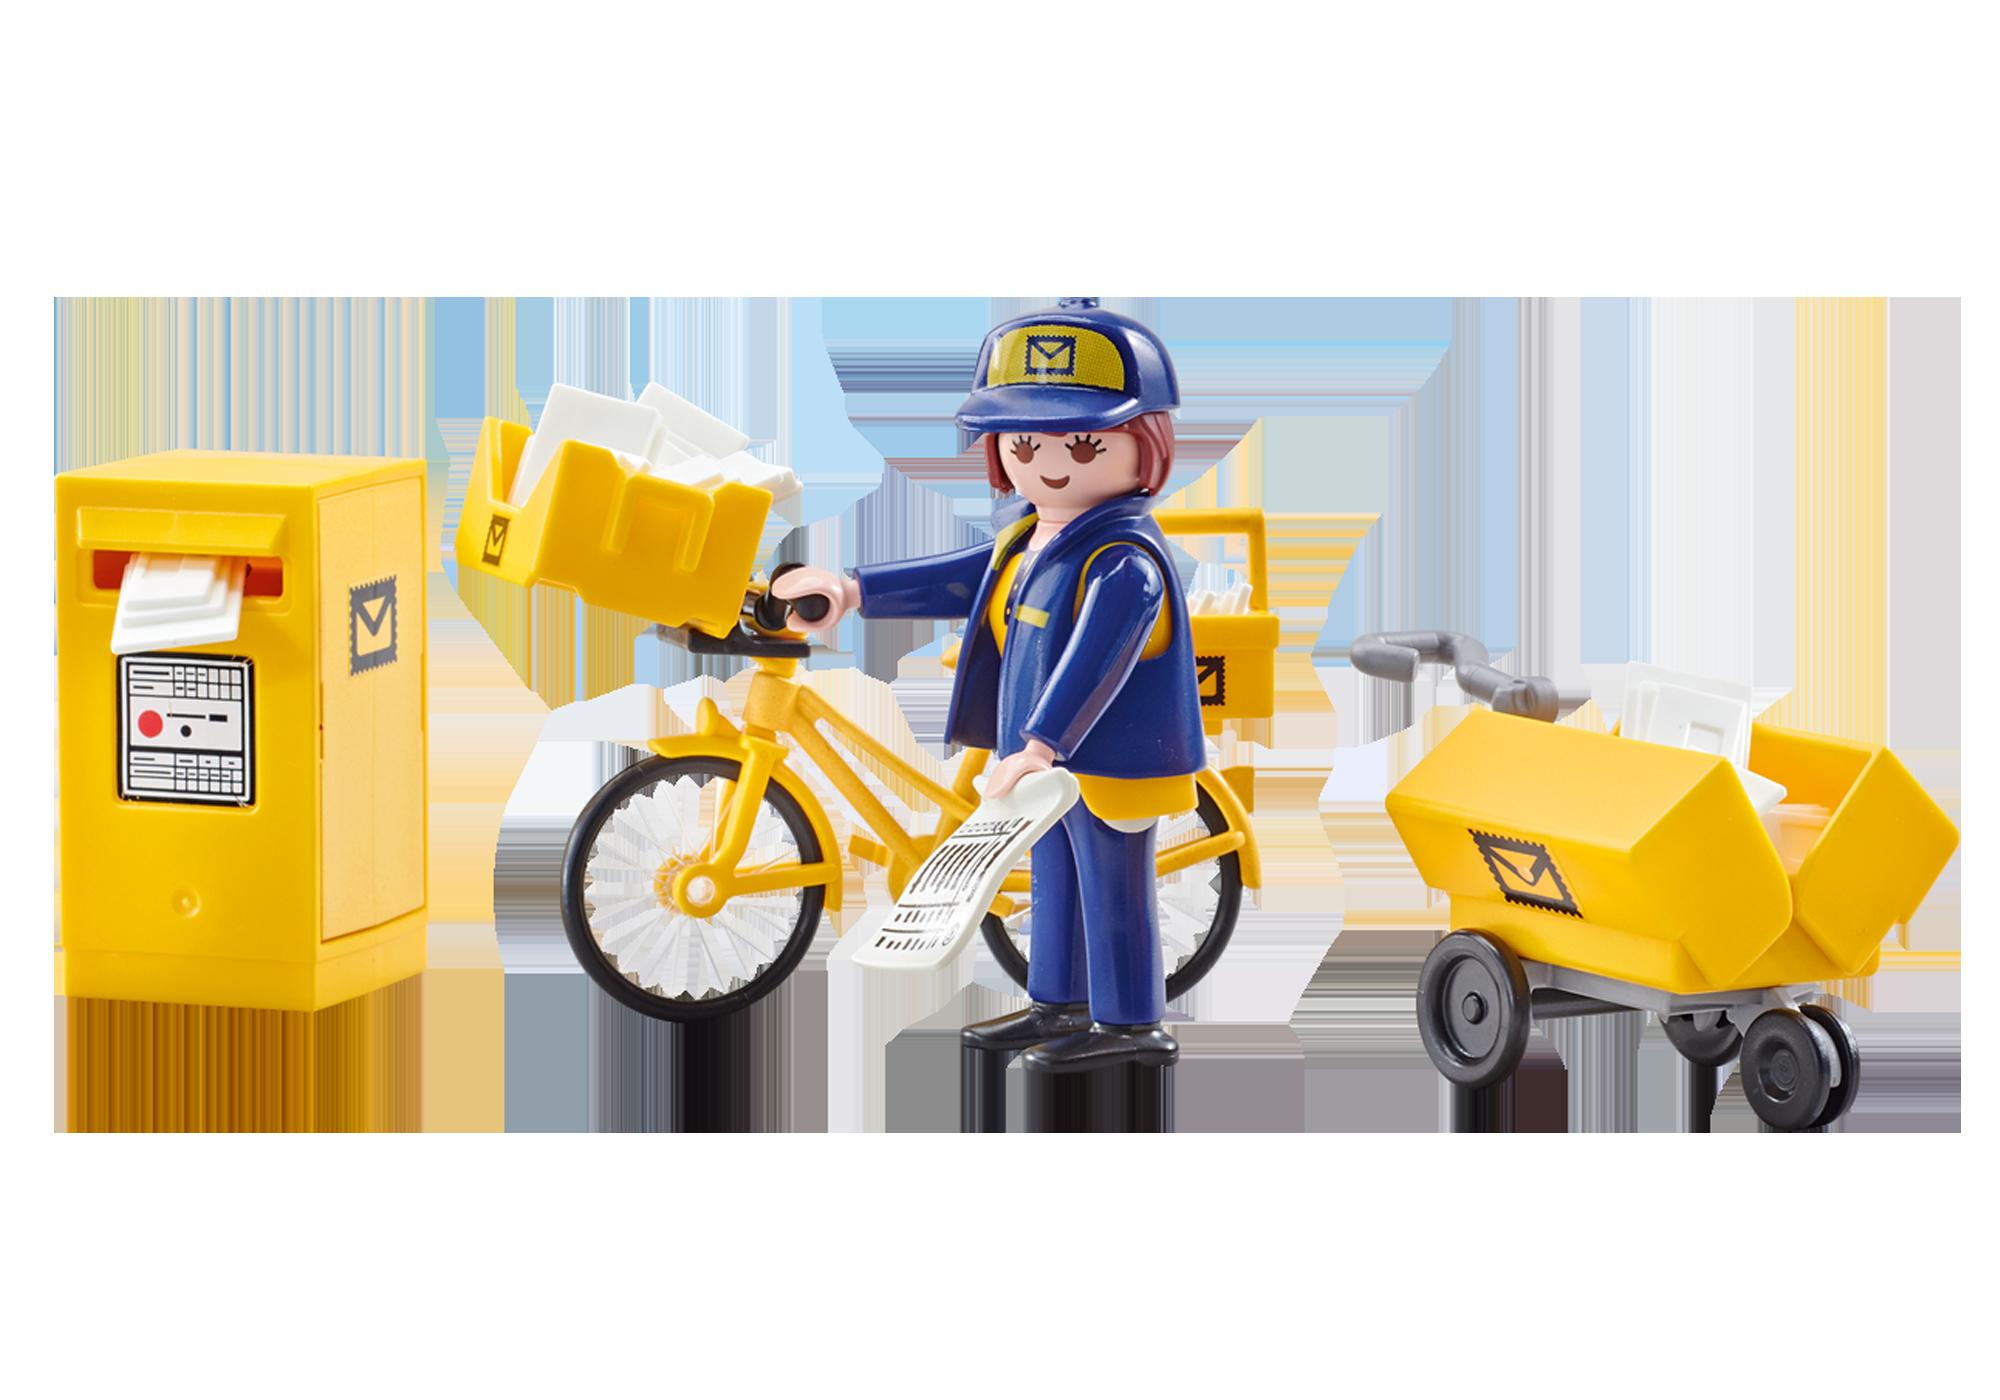 http://media.playmobil.com/i/playmobil/9806_product_detail/Γυναίκα Ταχυδρόμος με ποδήλατο